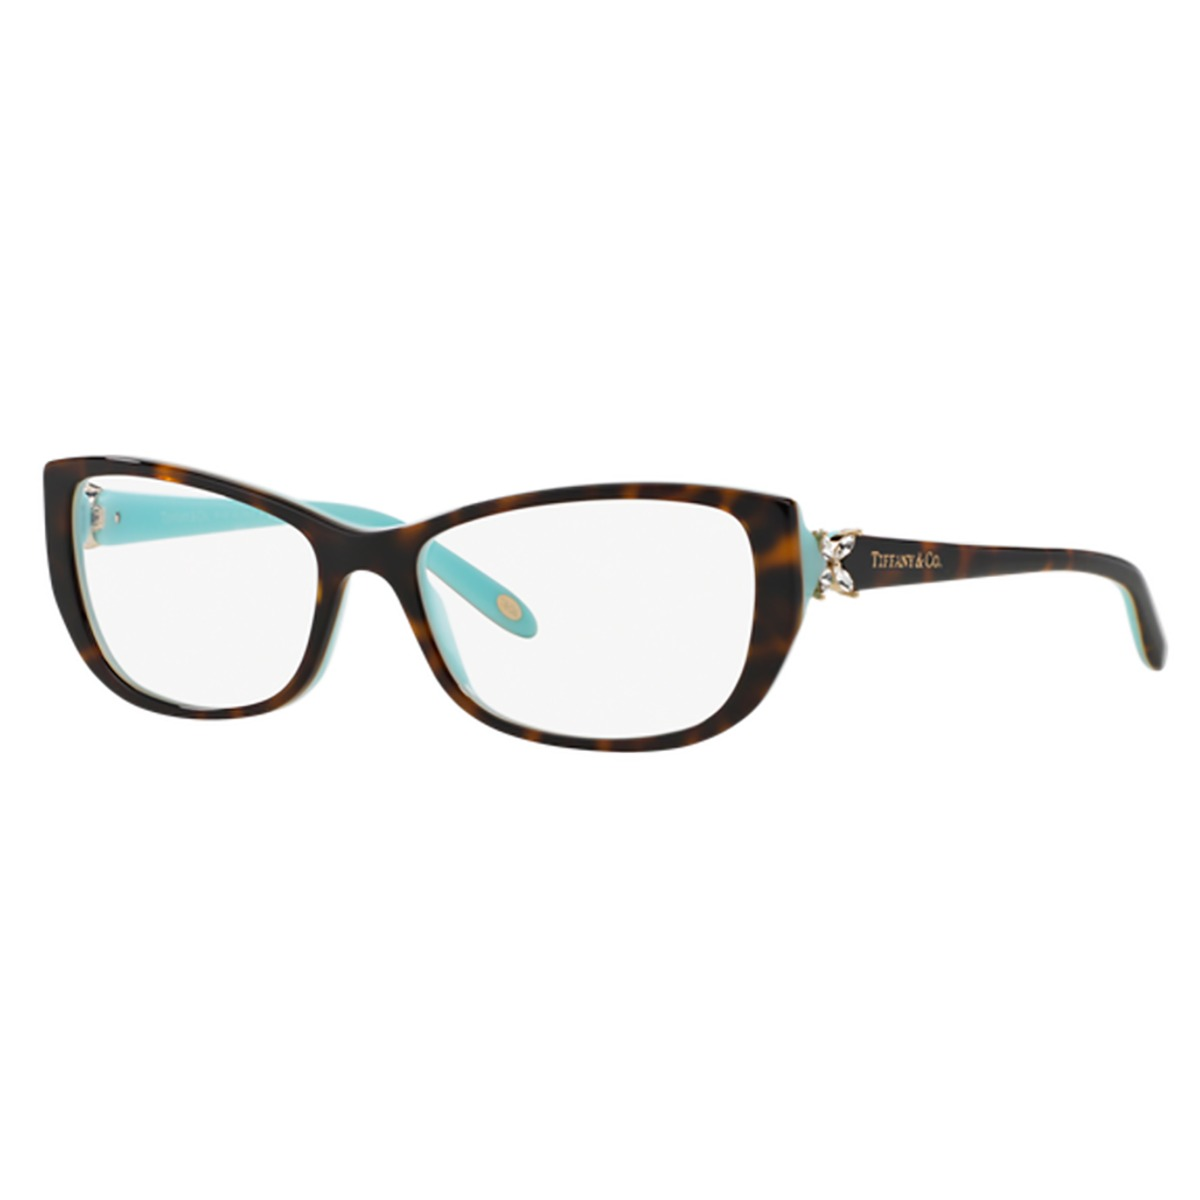 fddb466a6f89e Óculos De Grau Tiffany   Co. Tf2044-b 8134 - R  1.298